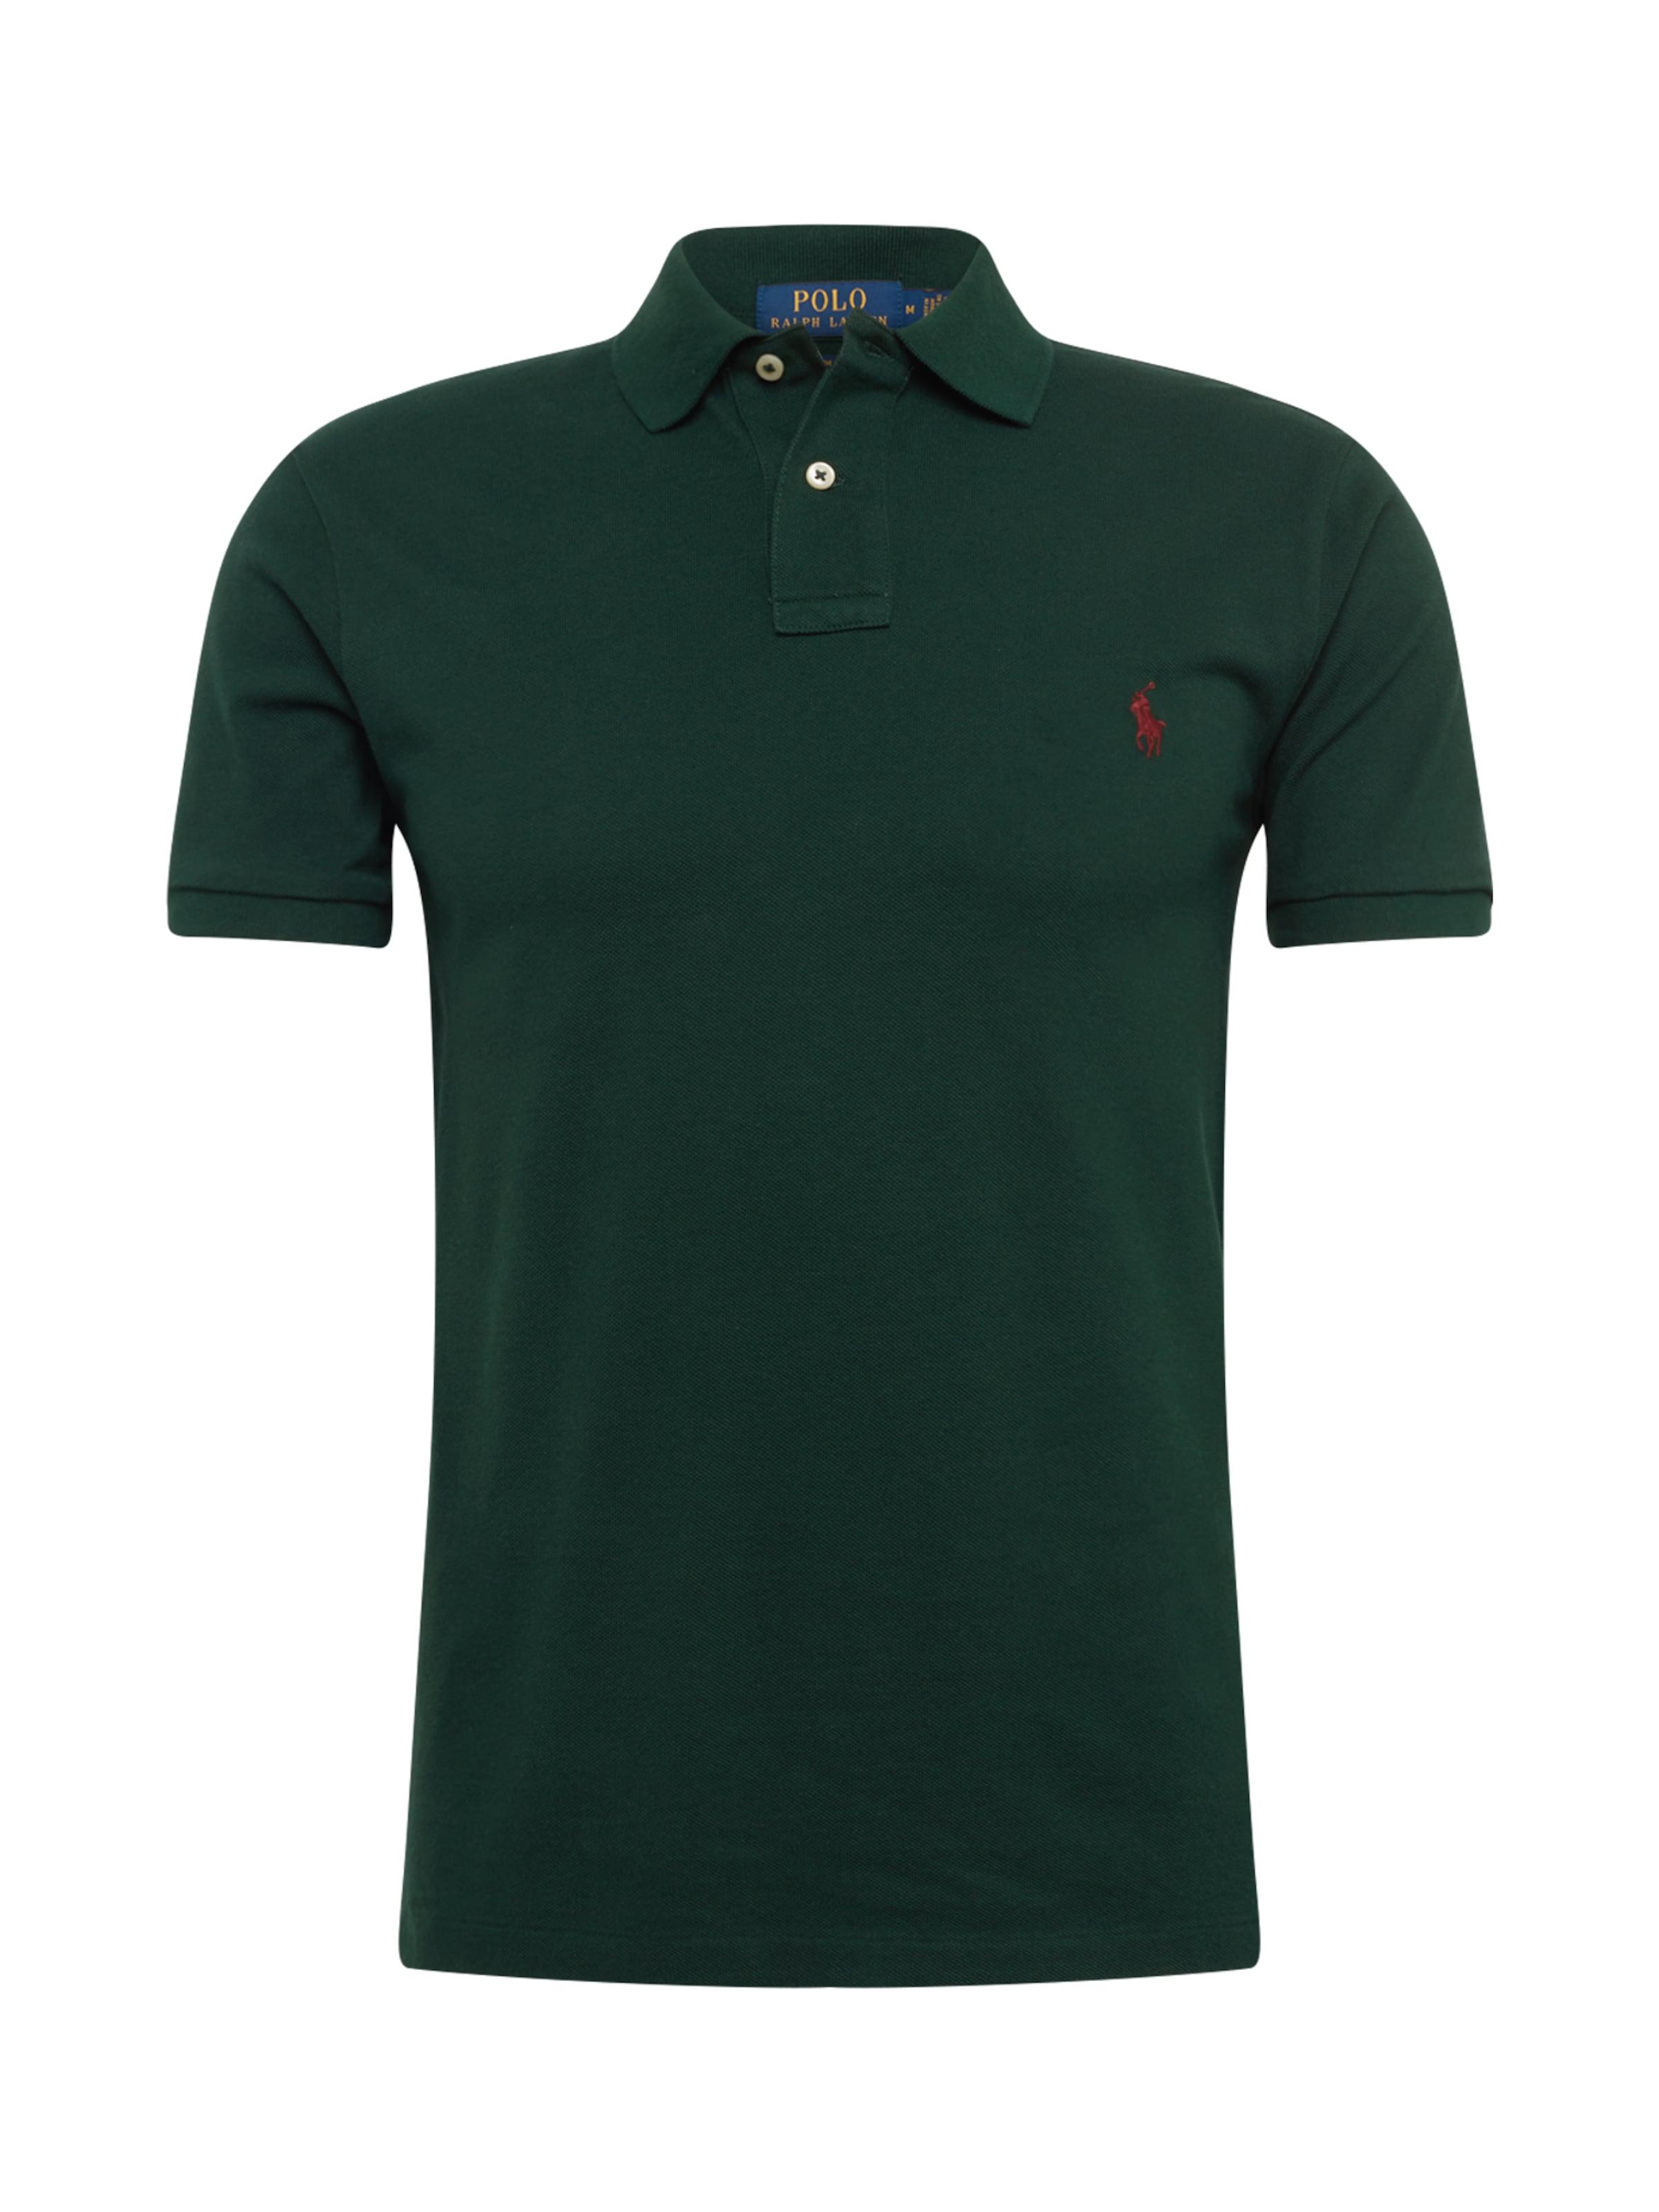 En shirt Polo Foncé Lauren 'sskcslm1 T Ralph knit' short Sleeve Vert qUVzMpS